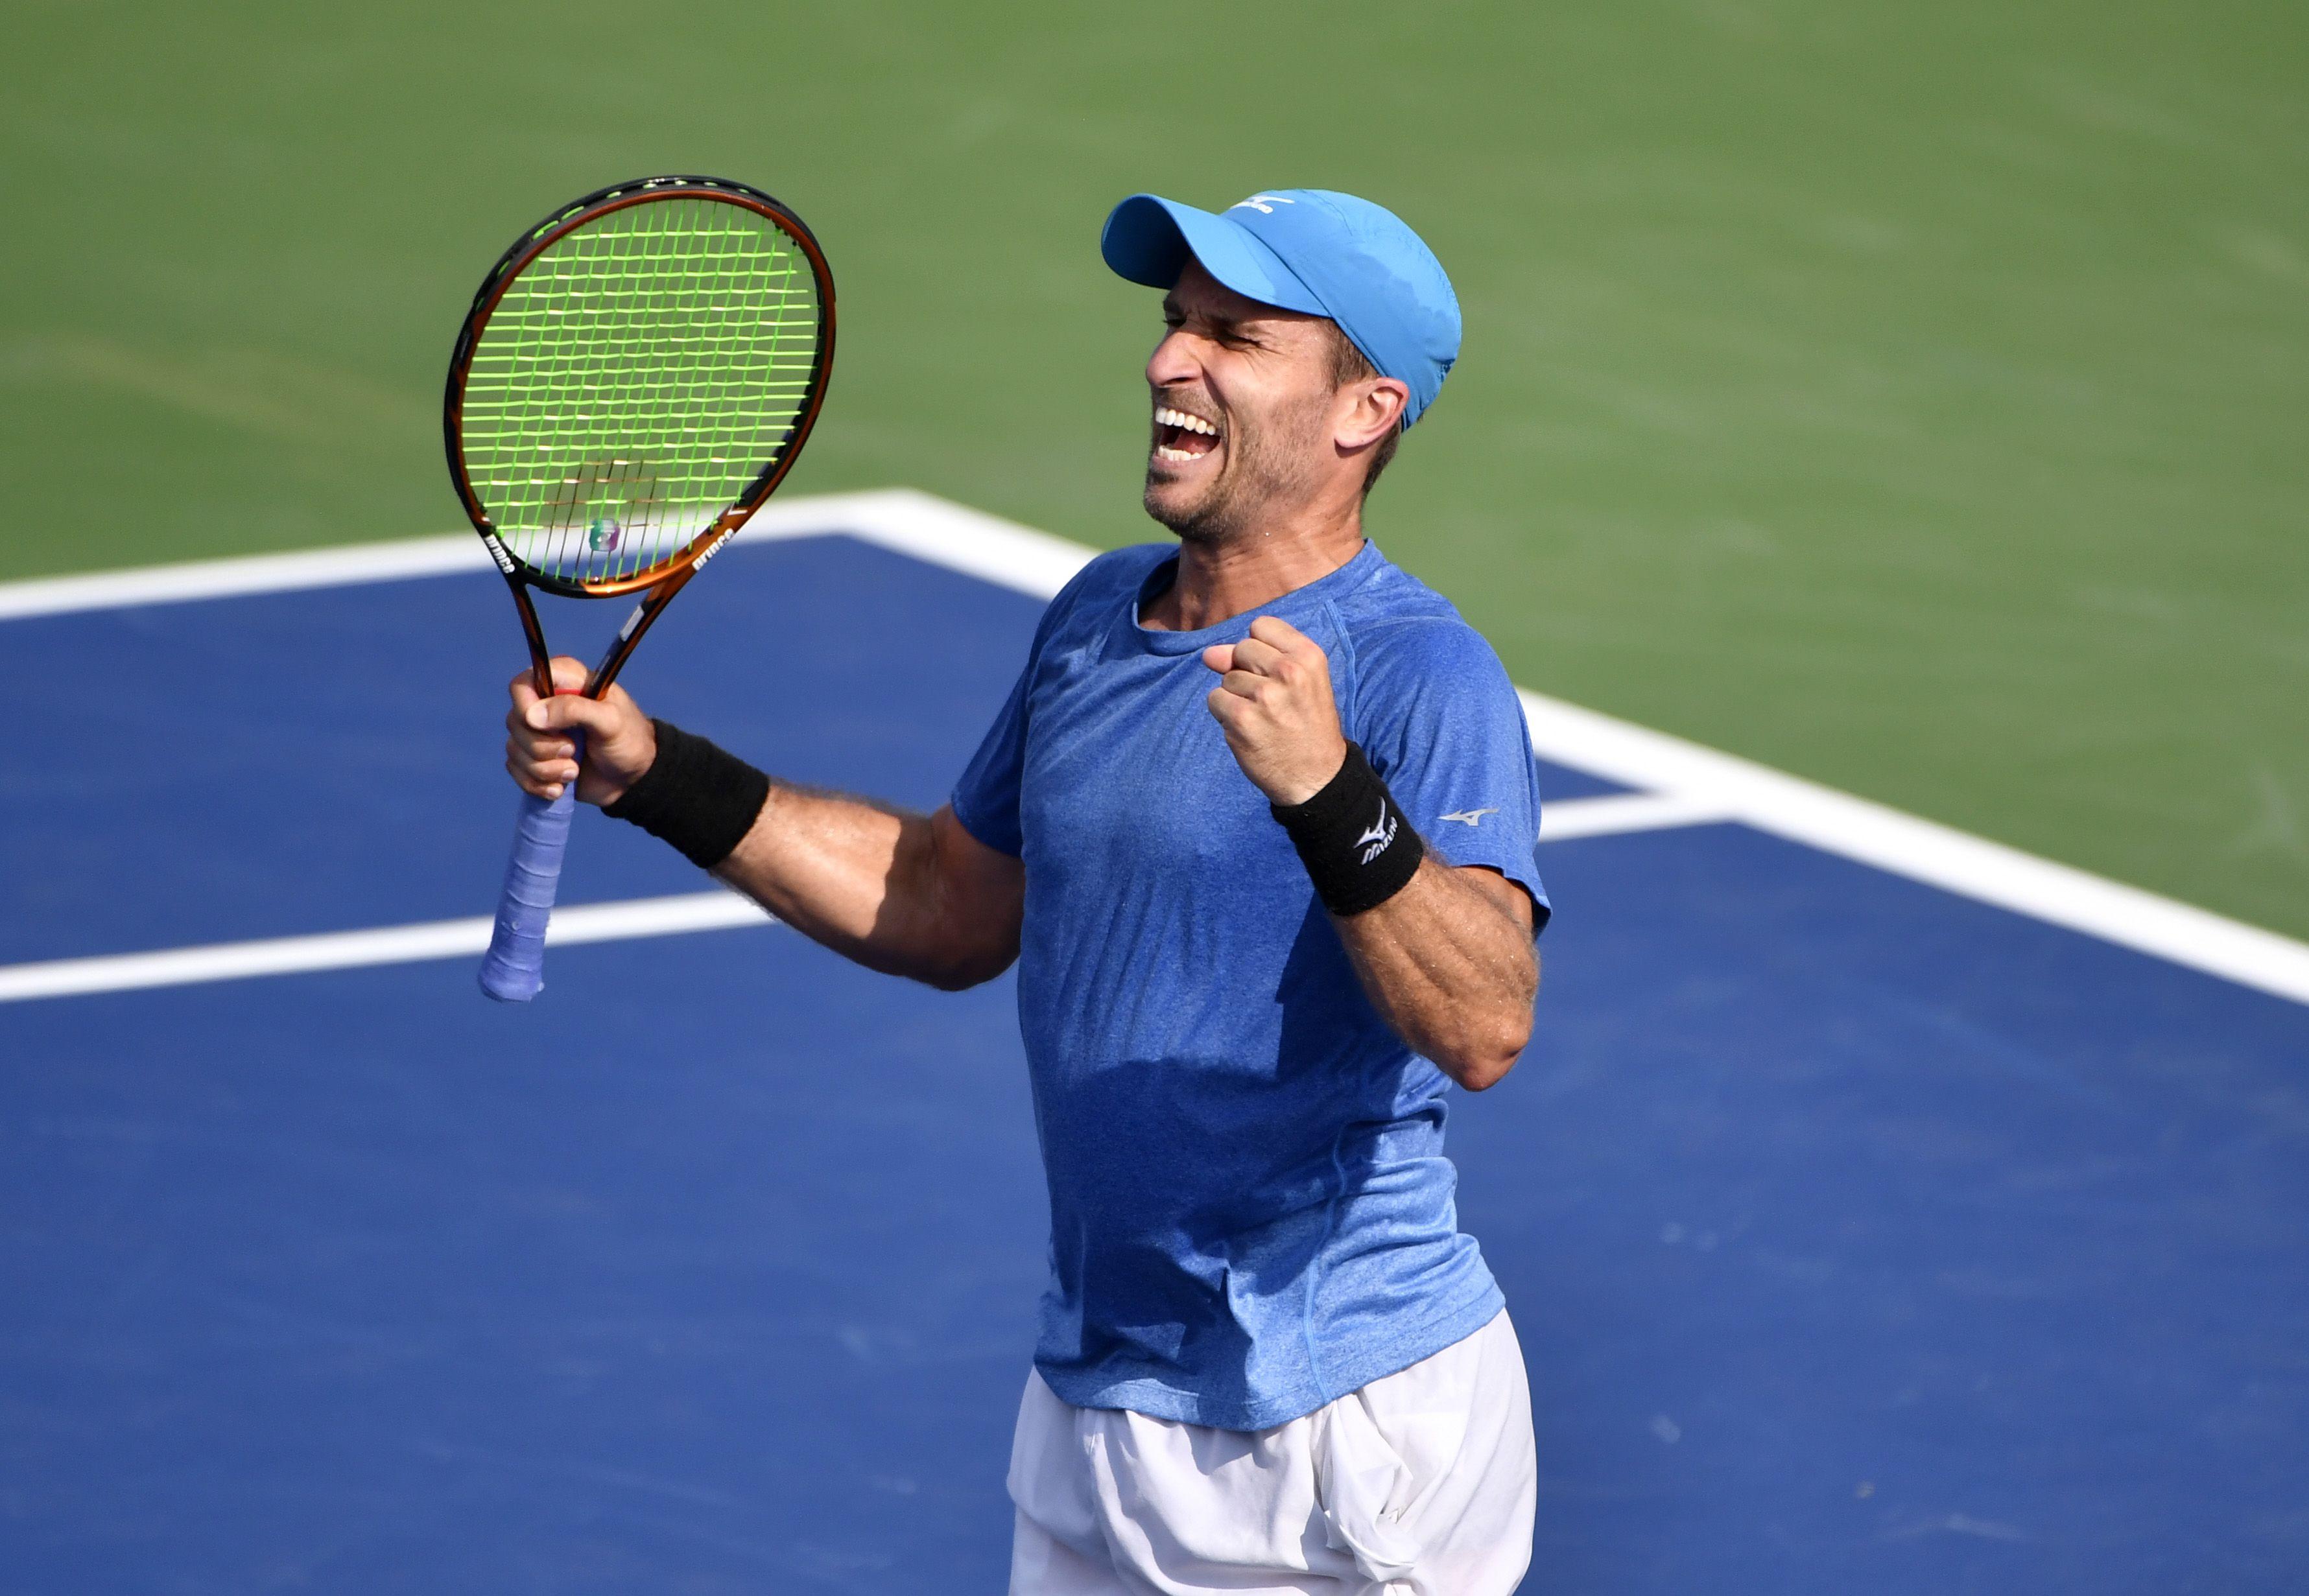 Steven Diez of Toronto wins first qualifying match for U.S. Open